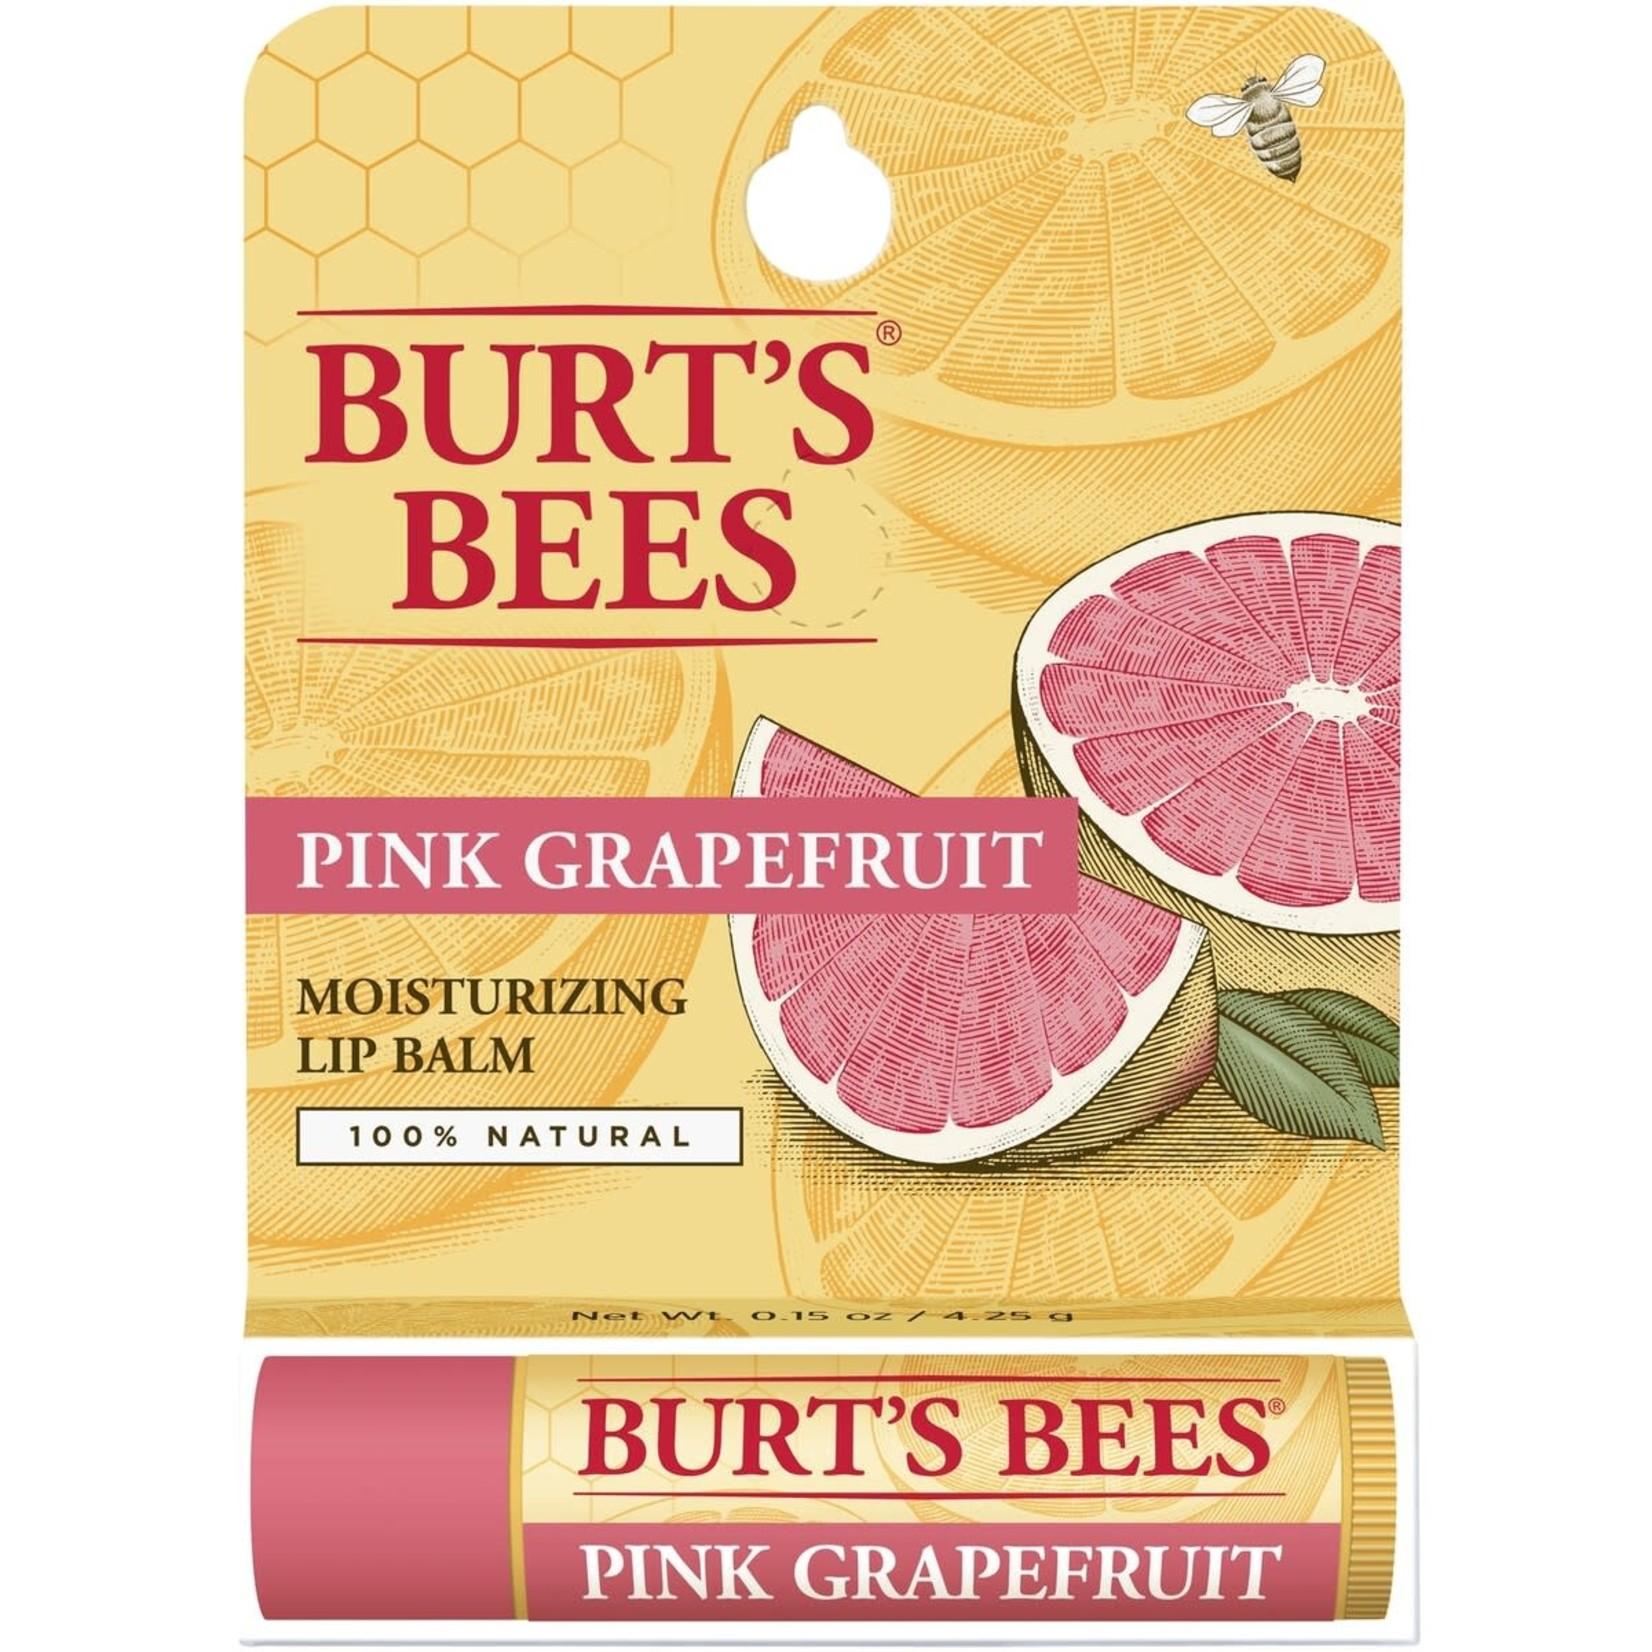 Burt's Bee Burt's Bees Natural Lip Balm Pink Grapefruit